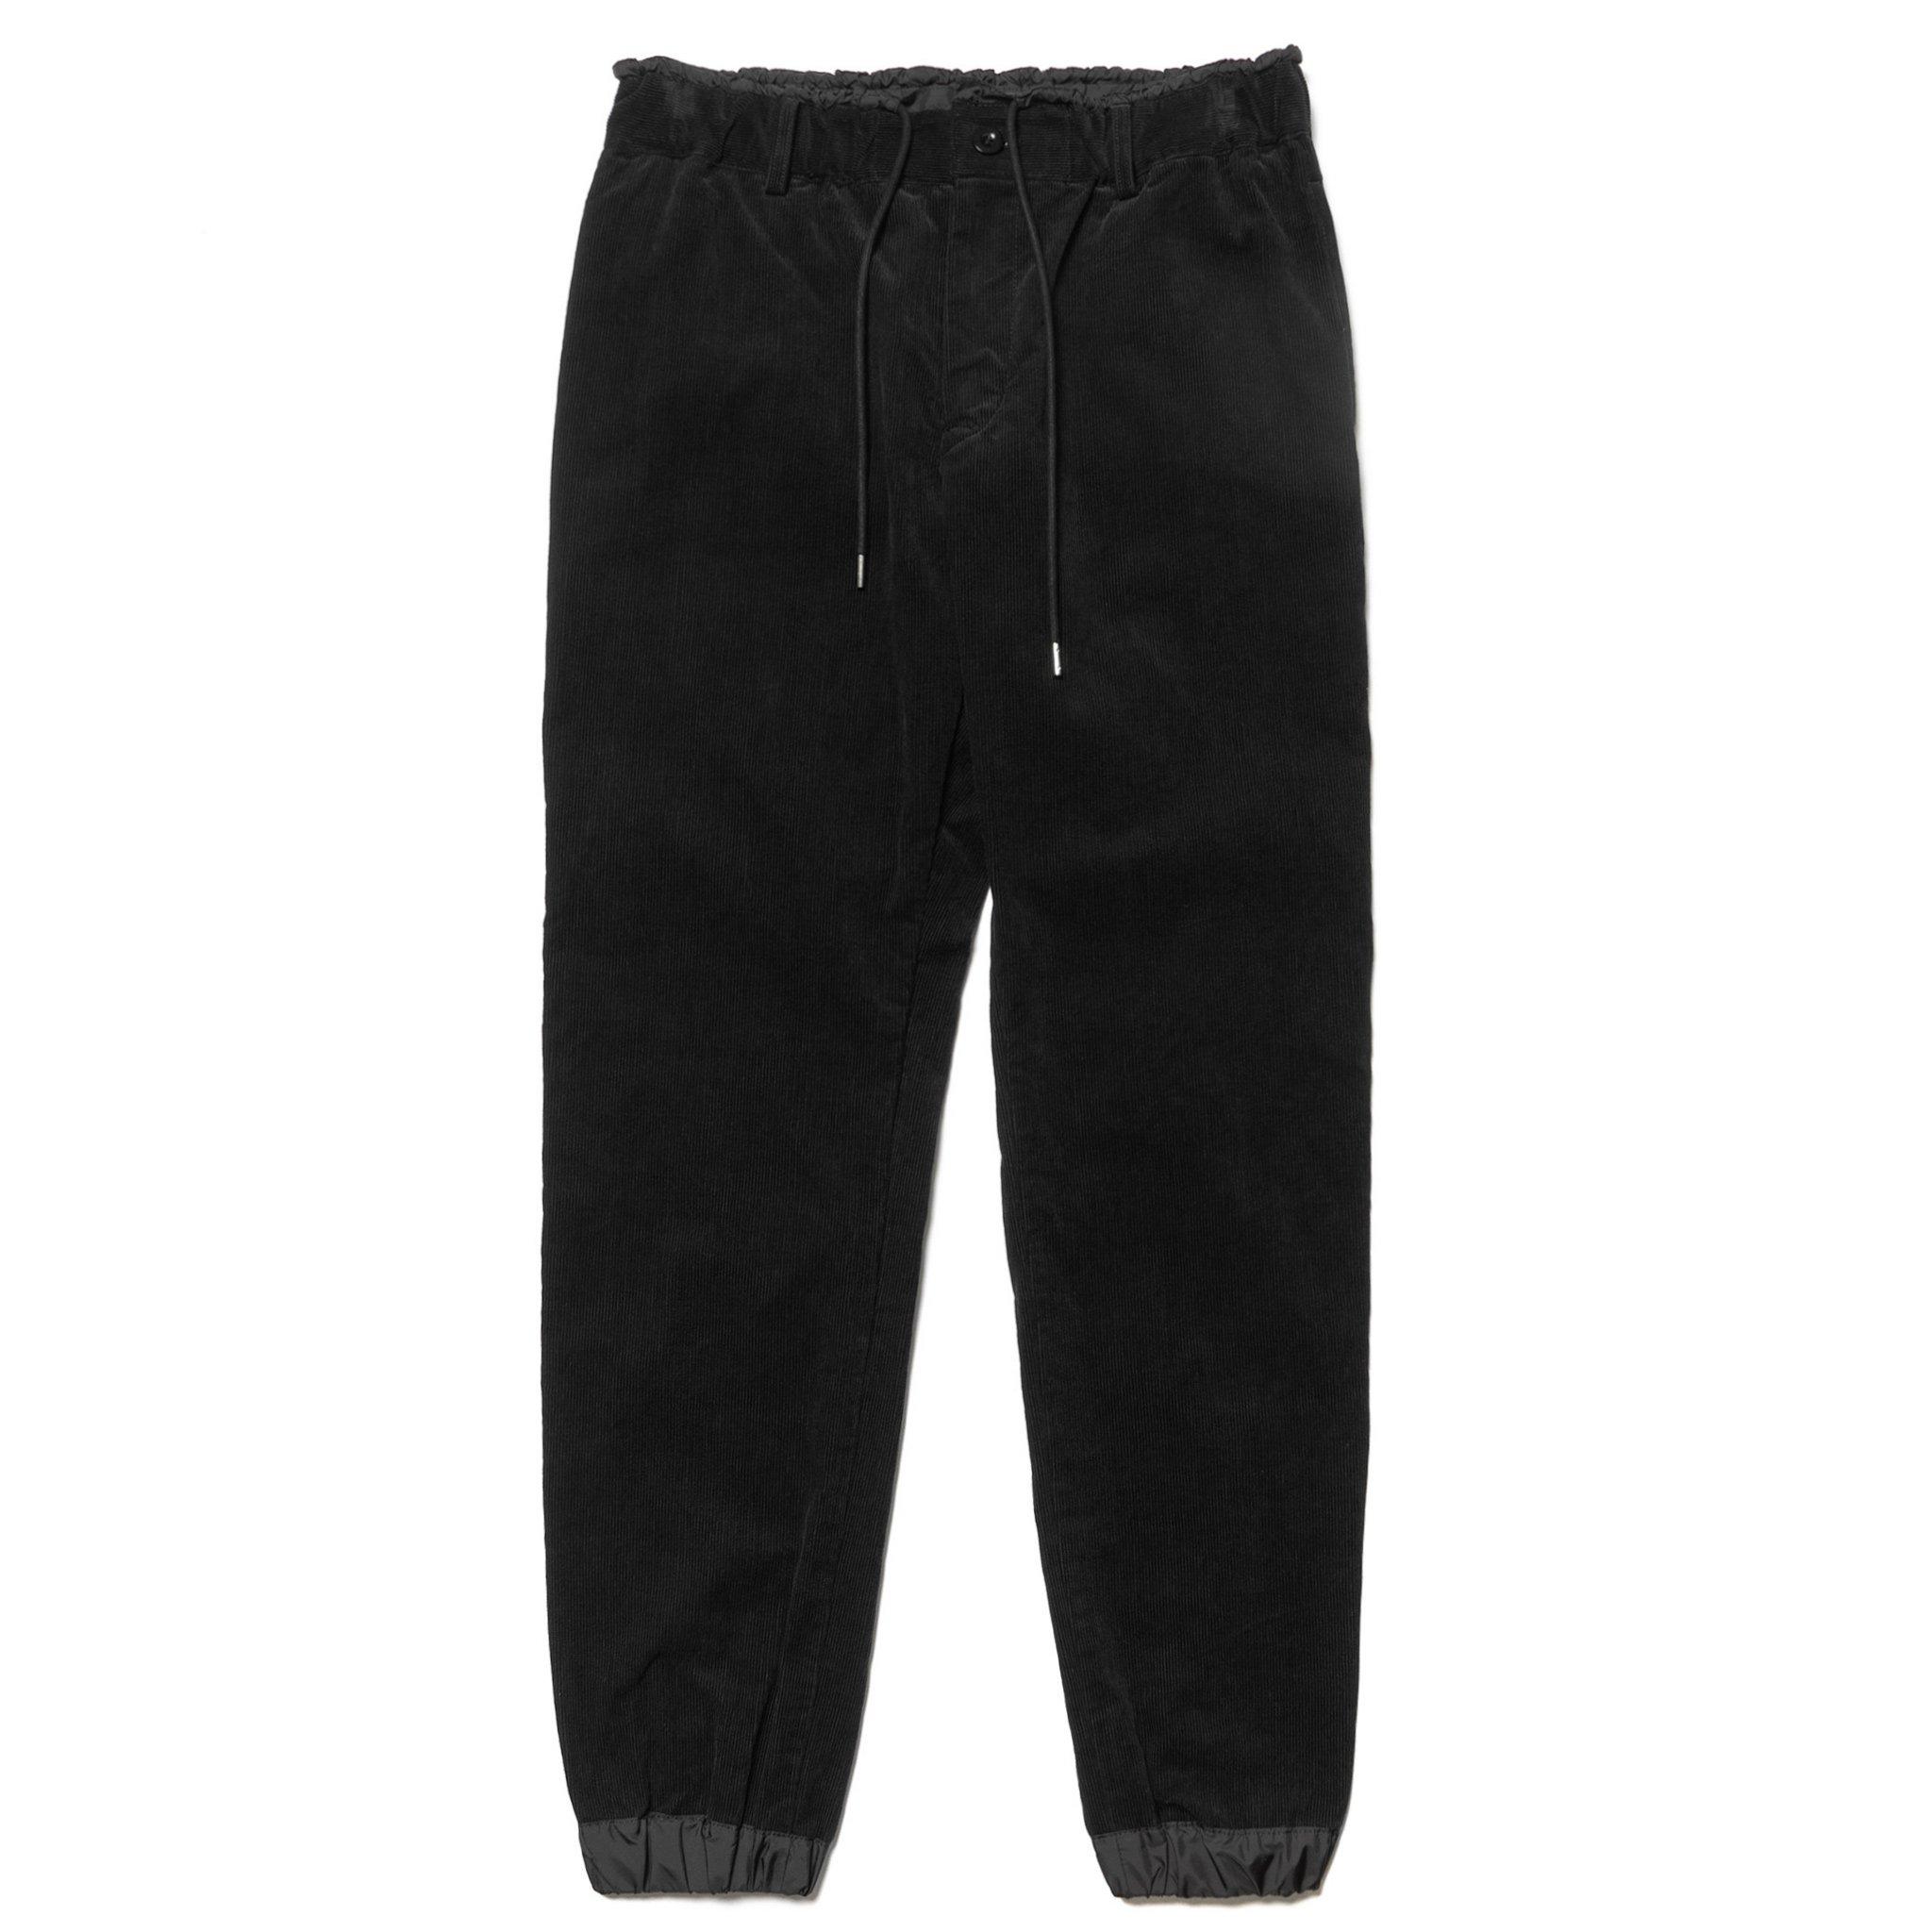 HAVEN-Sacai-Corduroy-Pants-BLACK-1_2048x2048.progressive.jpg